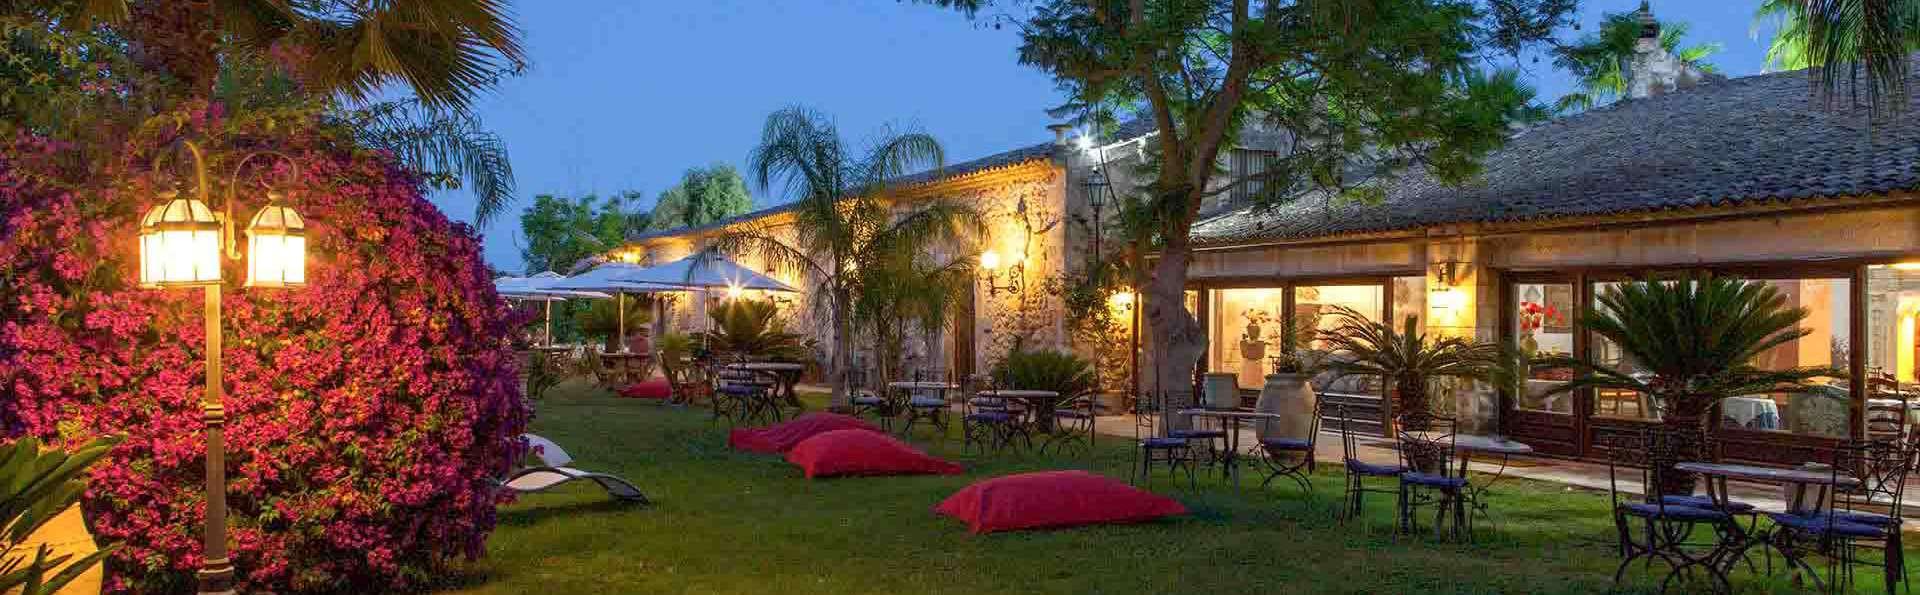 Villa Dei Papiri - EDIT_Esterno_Lounge_-Area_comune_01.jpg